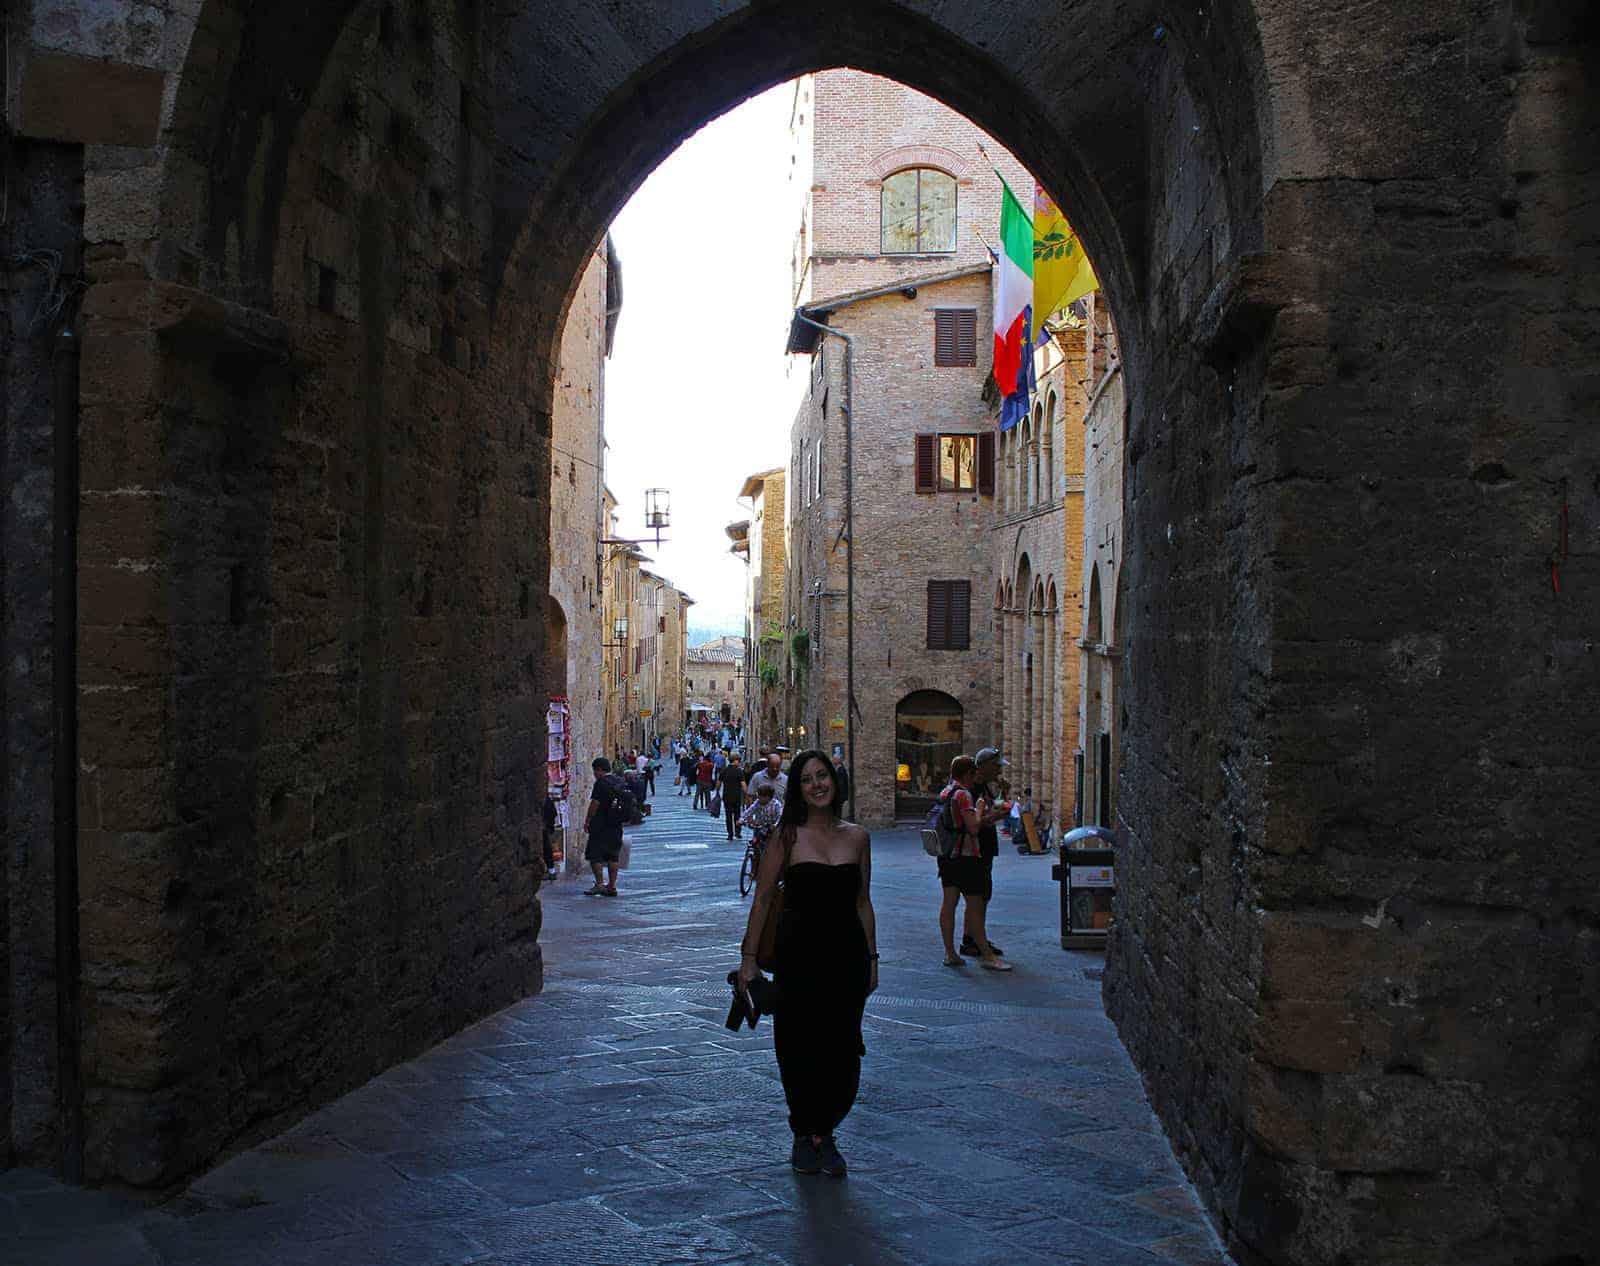 Tour of Tuscany with Florencetown: San Gimignano